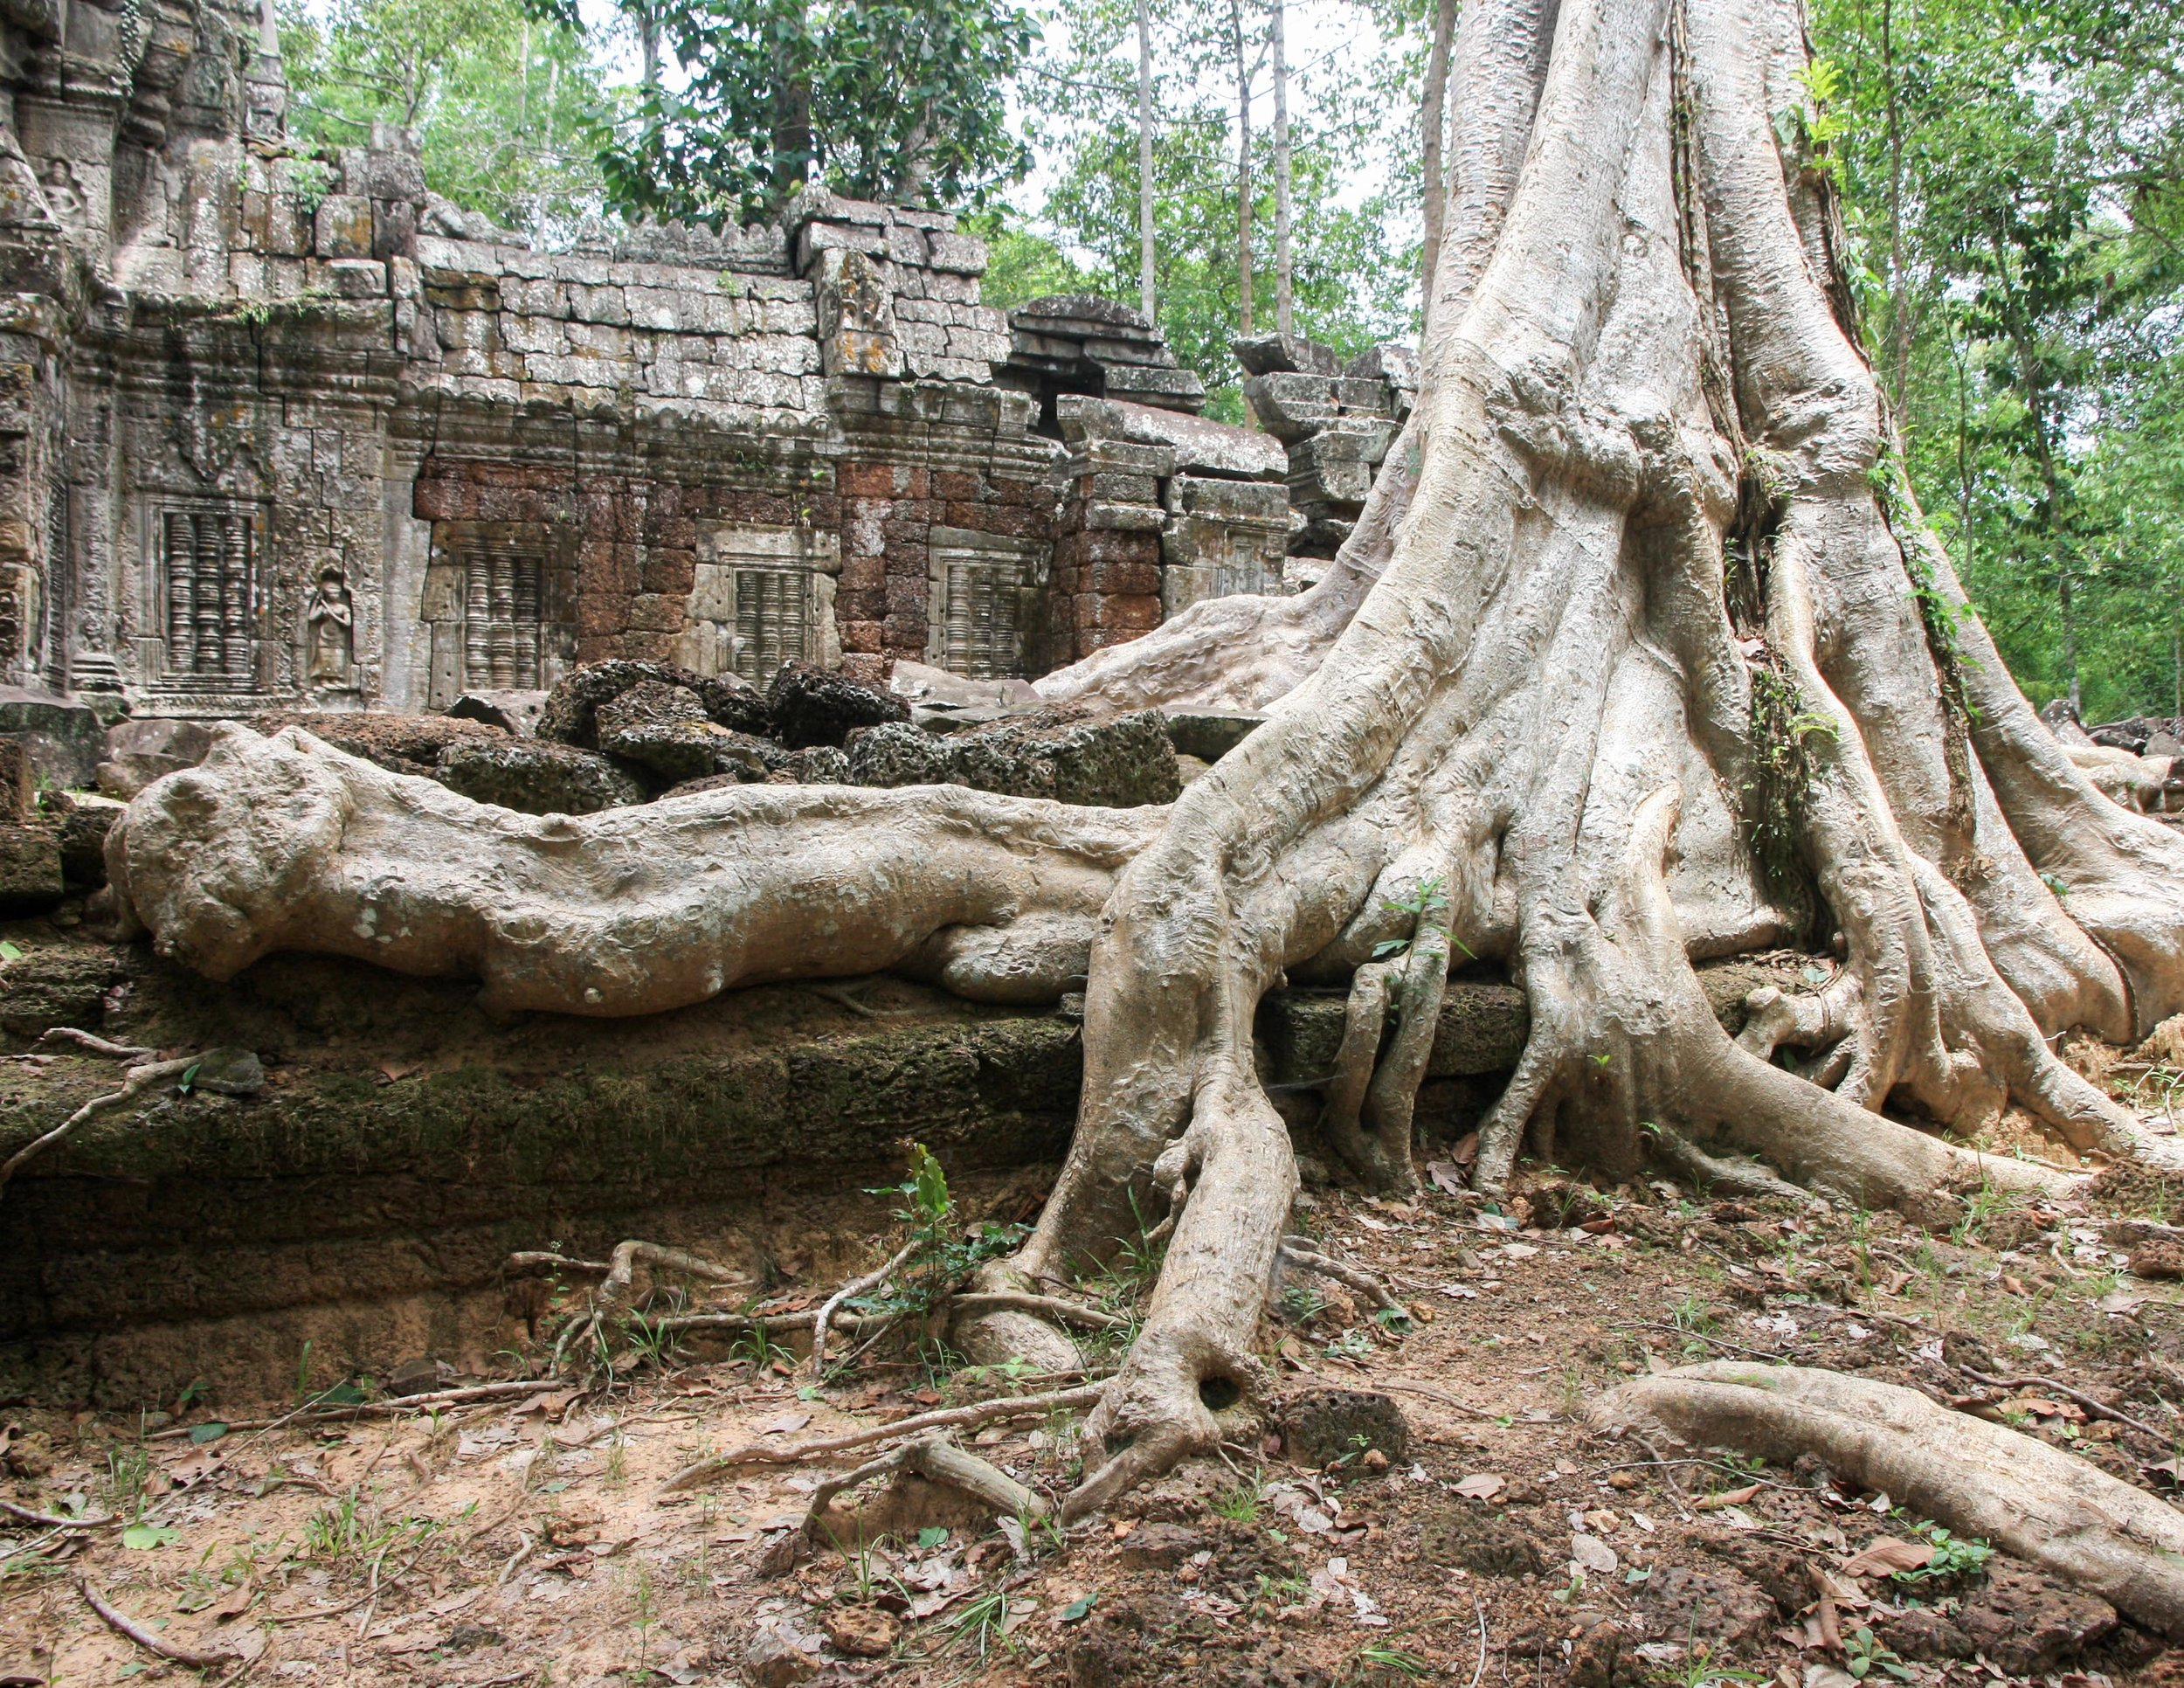 Cambodia Itinerary: Beng Melea